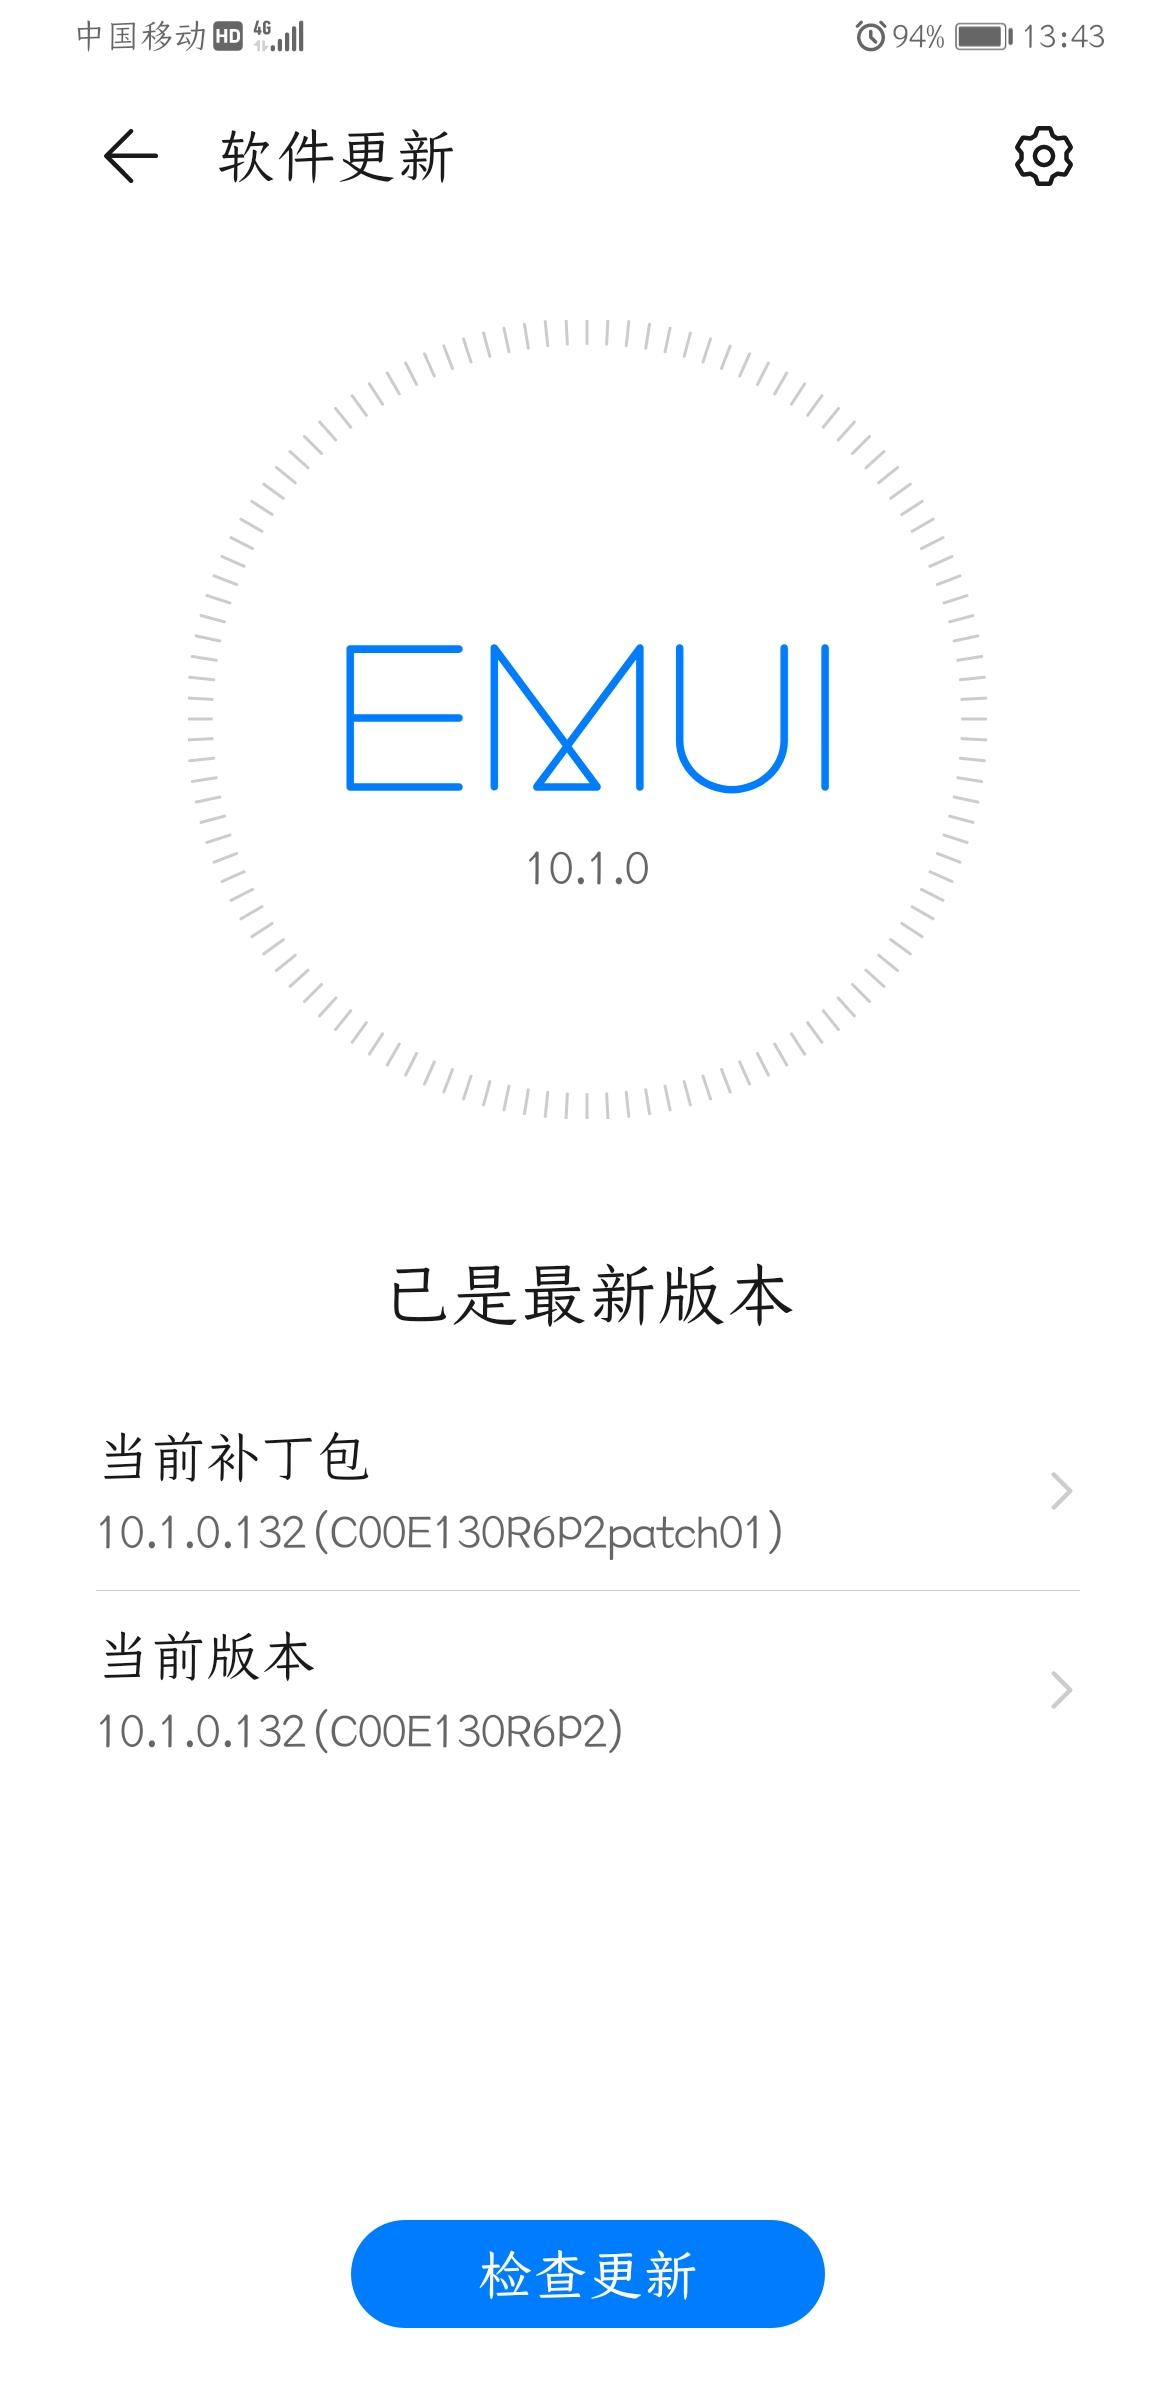 Screenshot_20200521_134340_com.huawei.android.hwouc.jpg